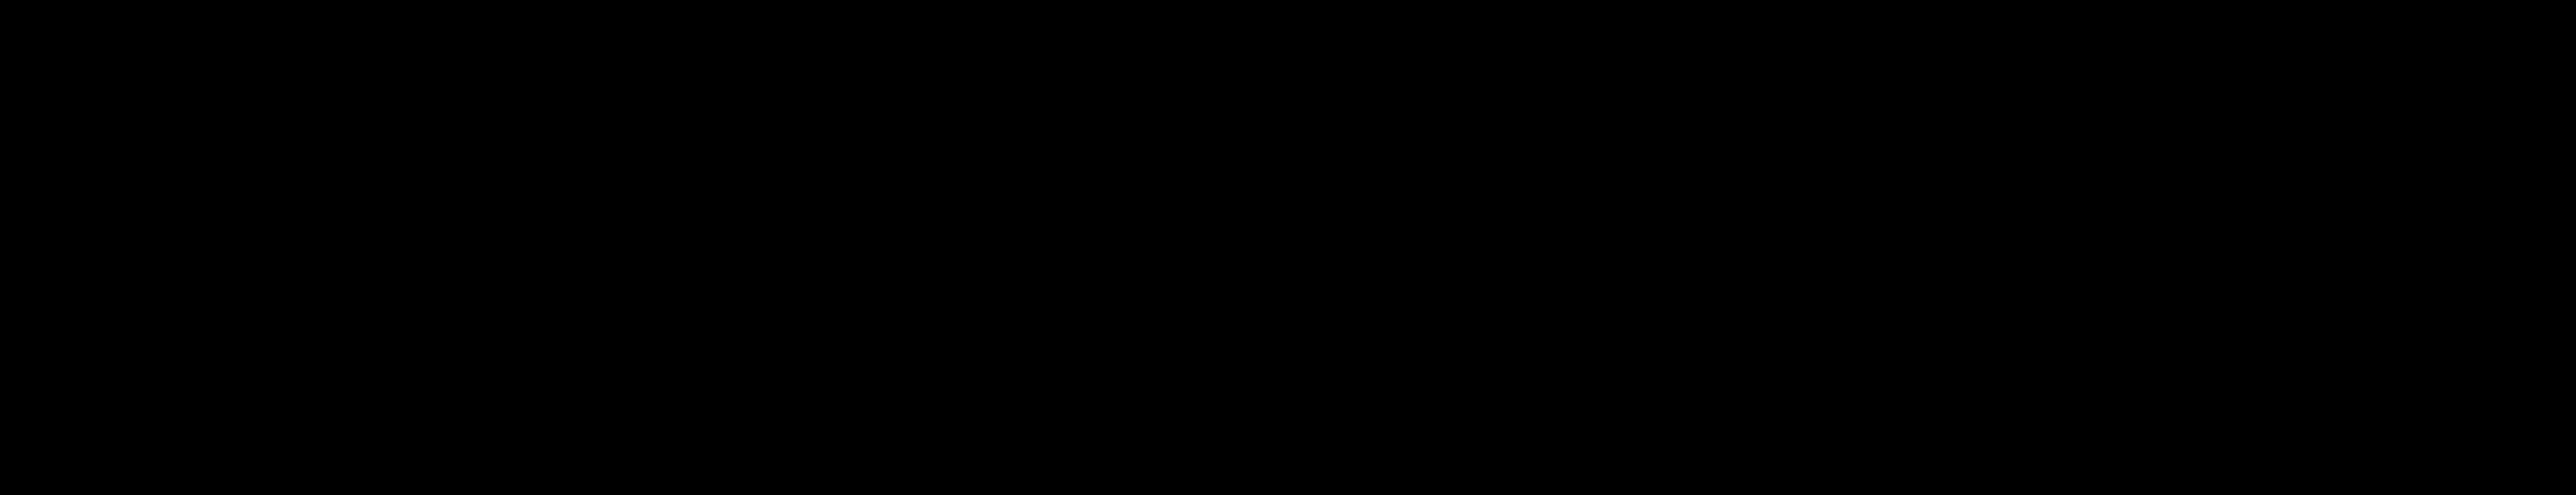 Playstation – Logos Download